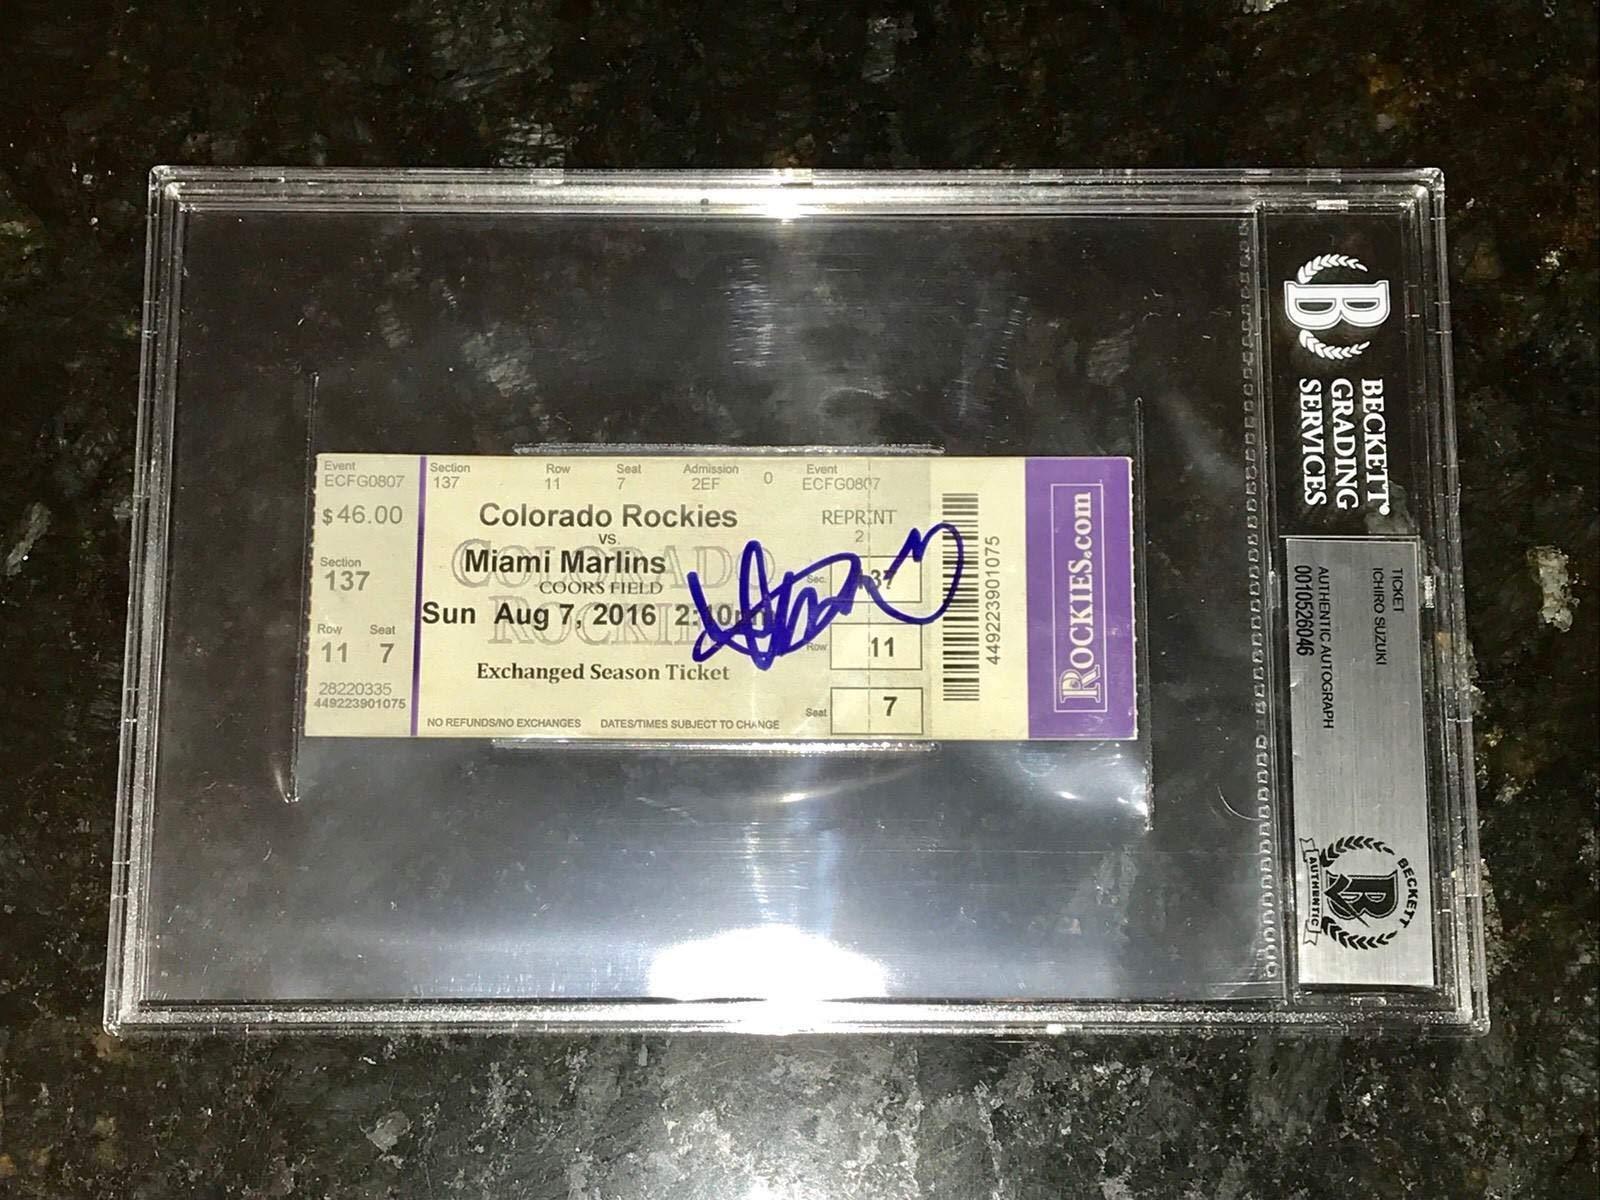 Ichiro Suzuki Autographed Signed Autograph 3000 Hit Ticket Slabbed Mariners Sports Memorabilia Beckett Authentic Memorabiliaated Bas